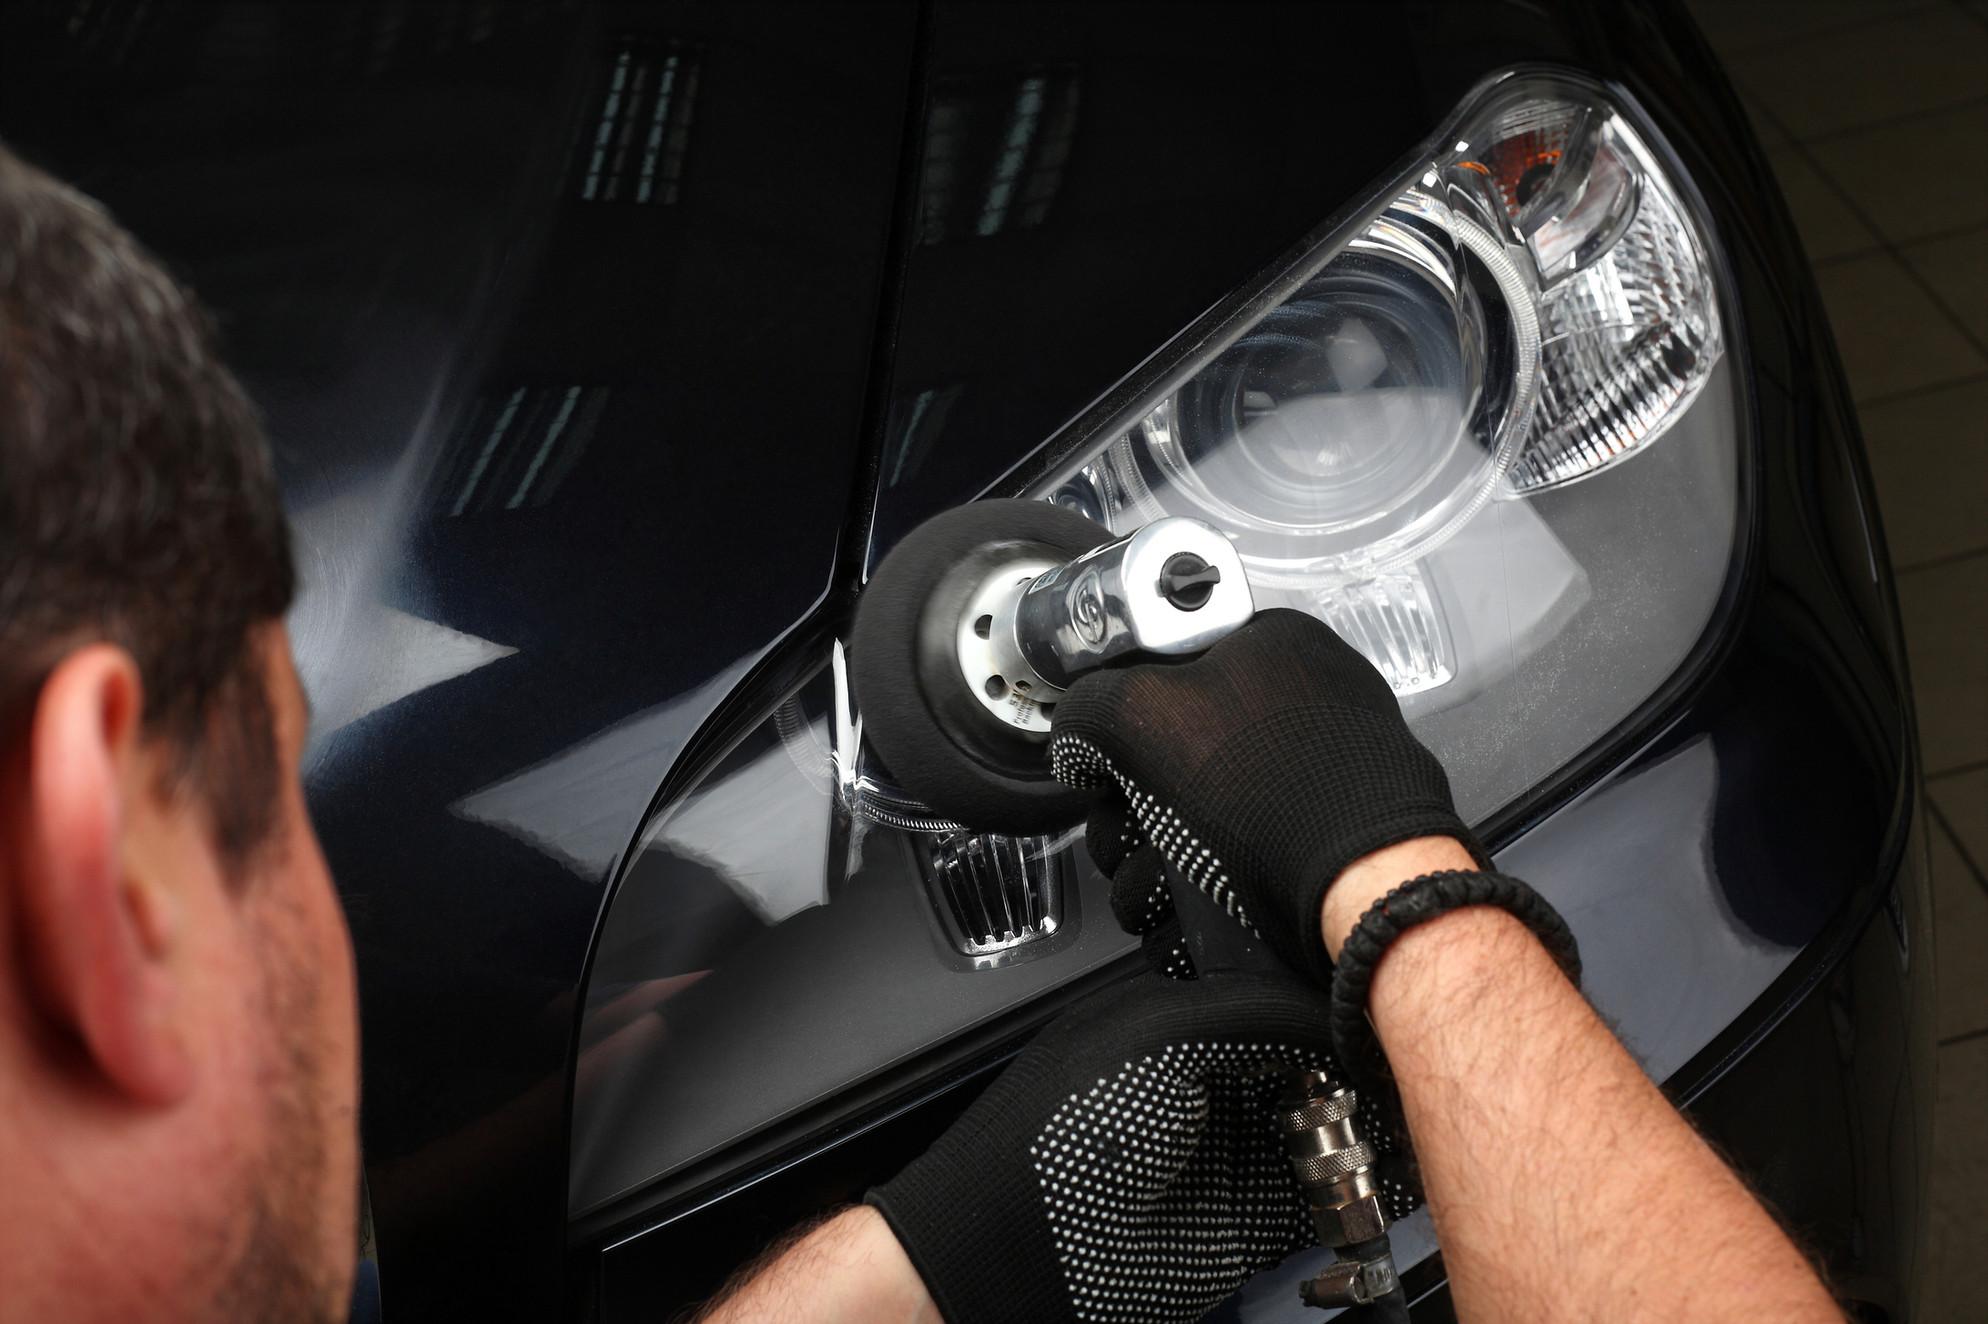 Rénovation optiques de phares